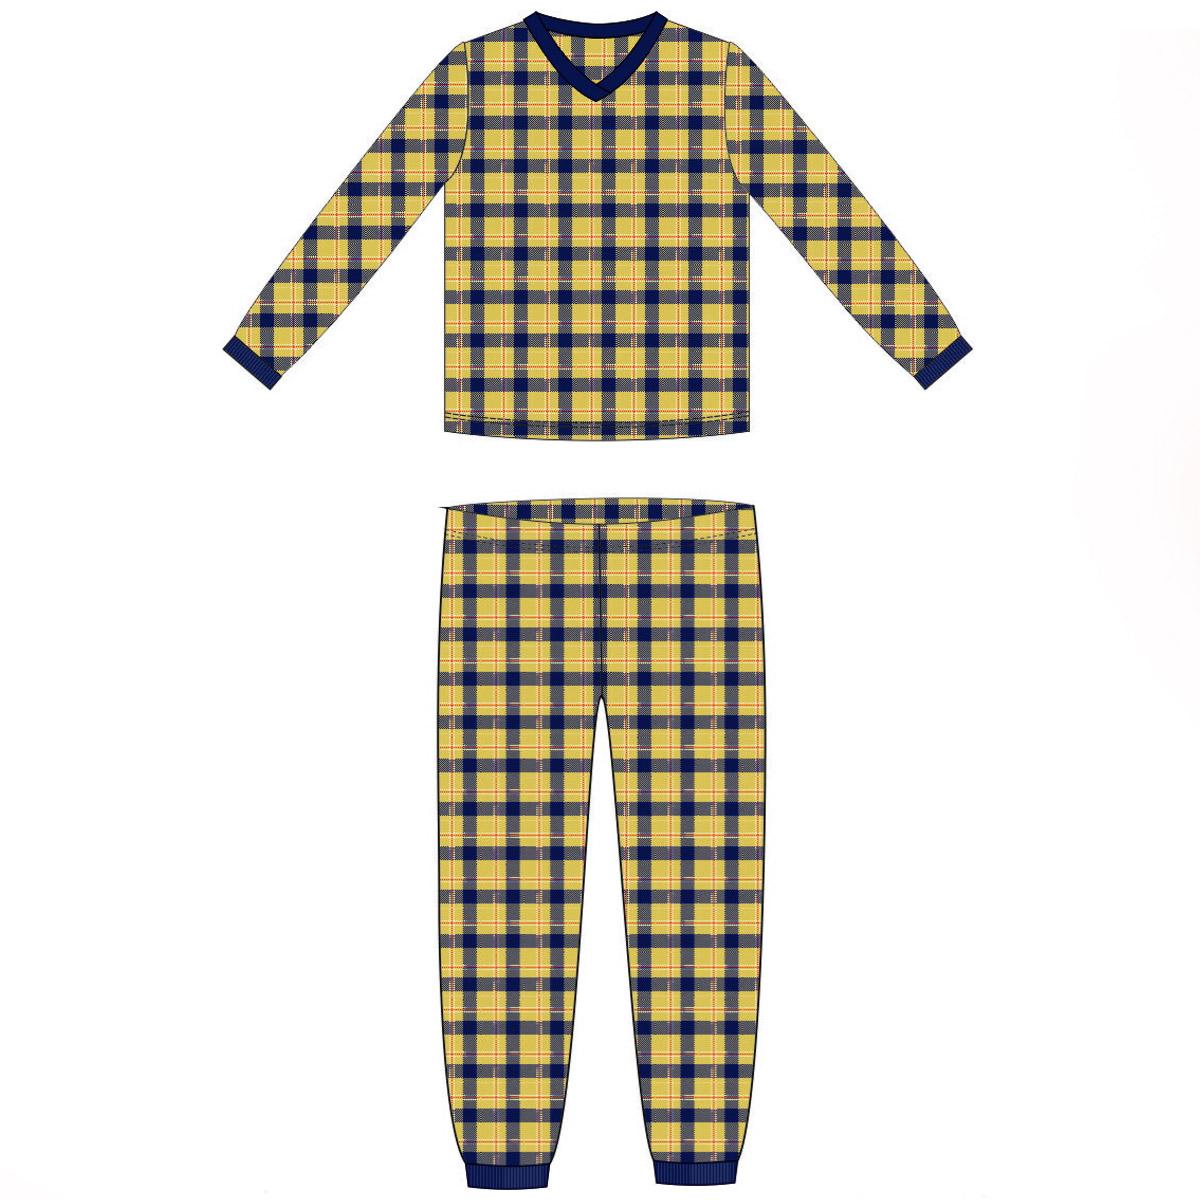 Пижама для мальчика Ёмаё (18-301) рост 86 клетка бежевая<br>